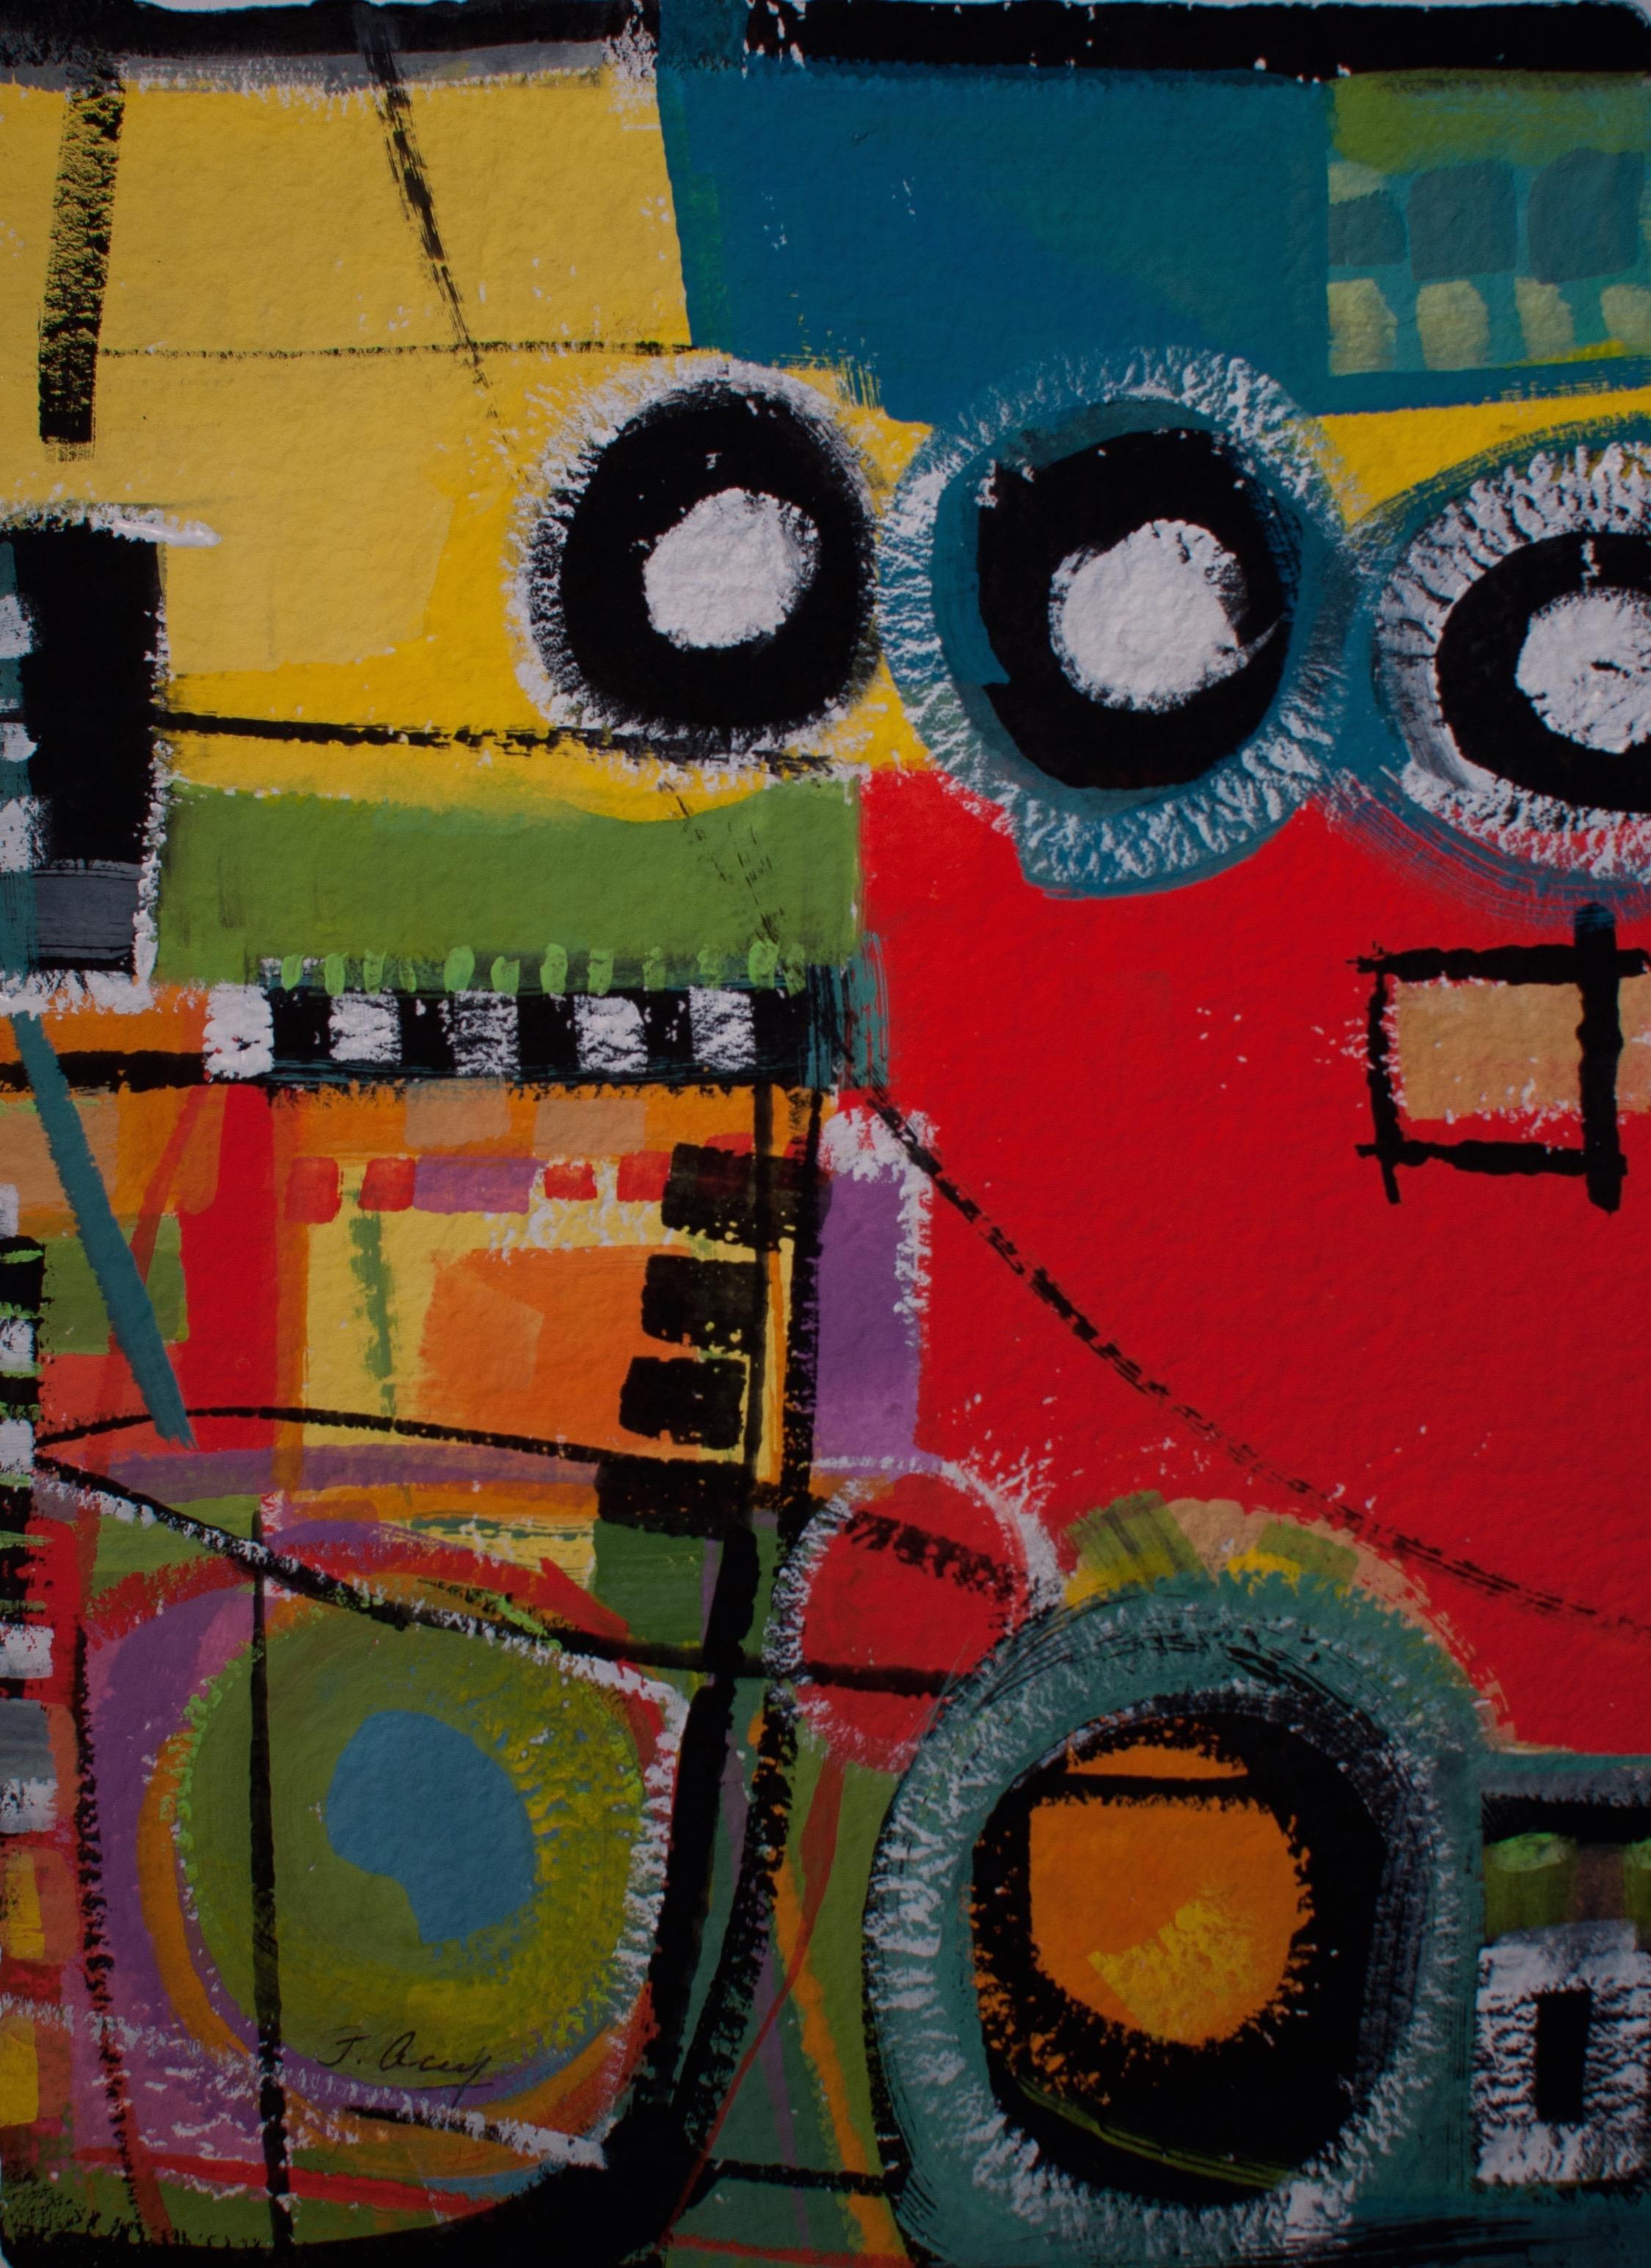 """Untitled"" No. 1, 2011"